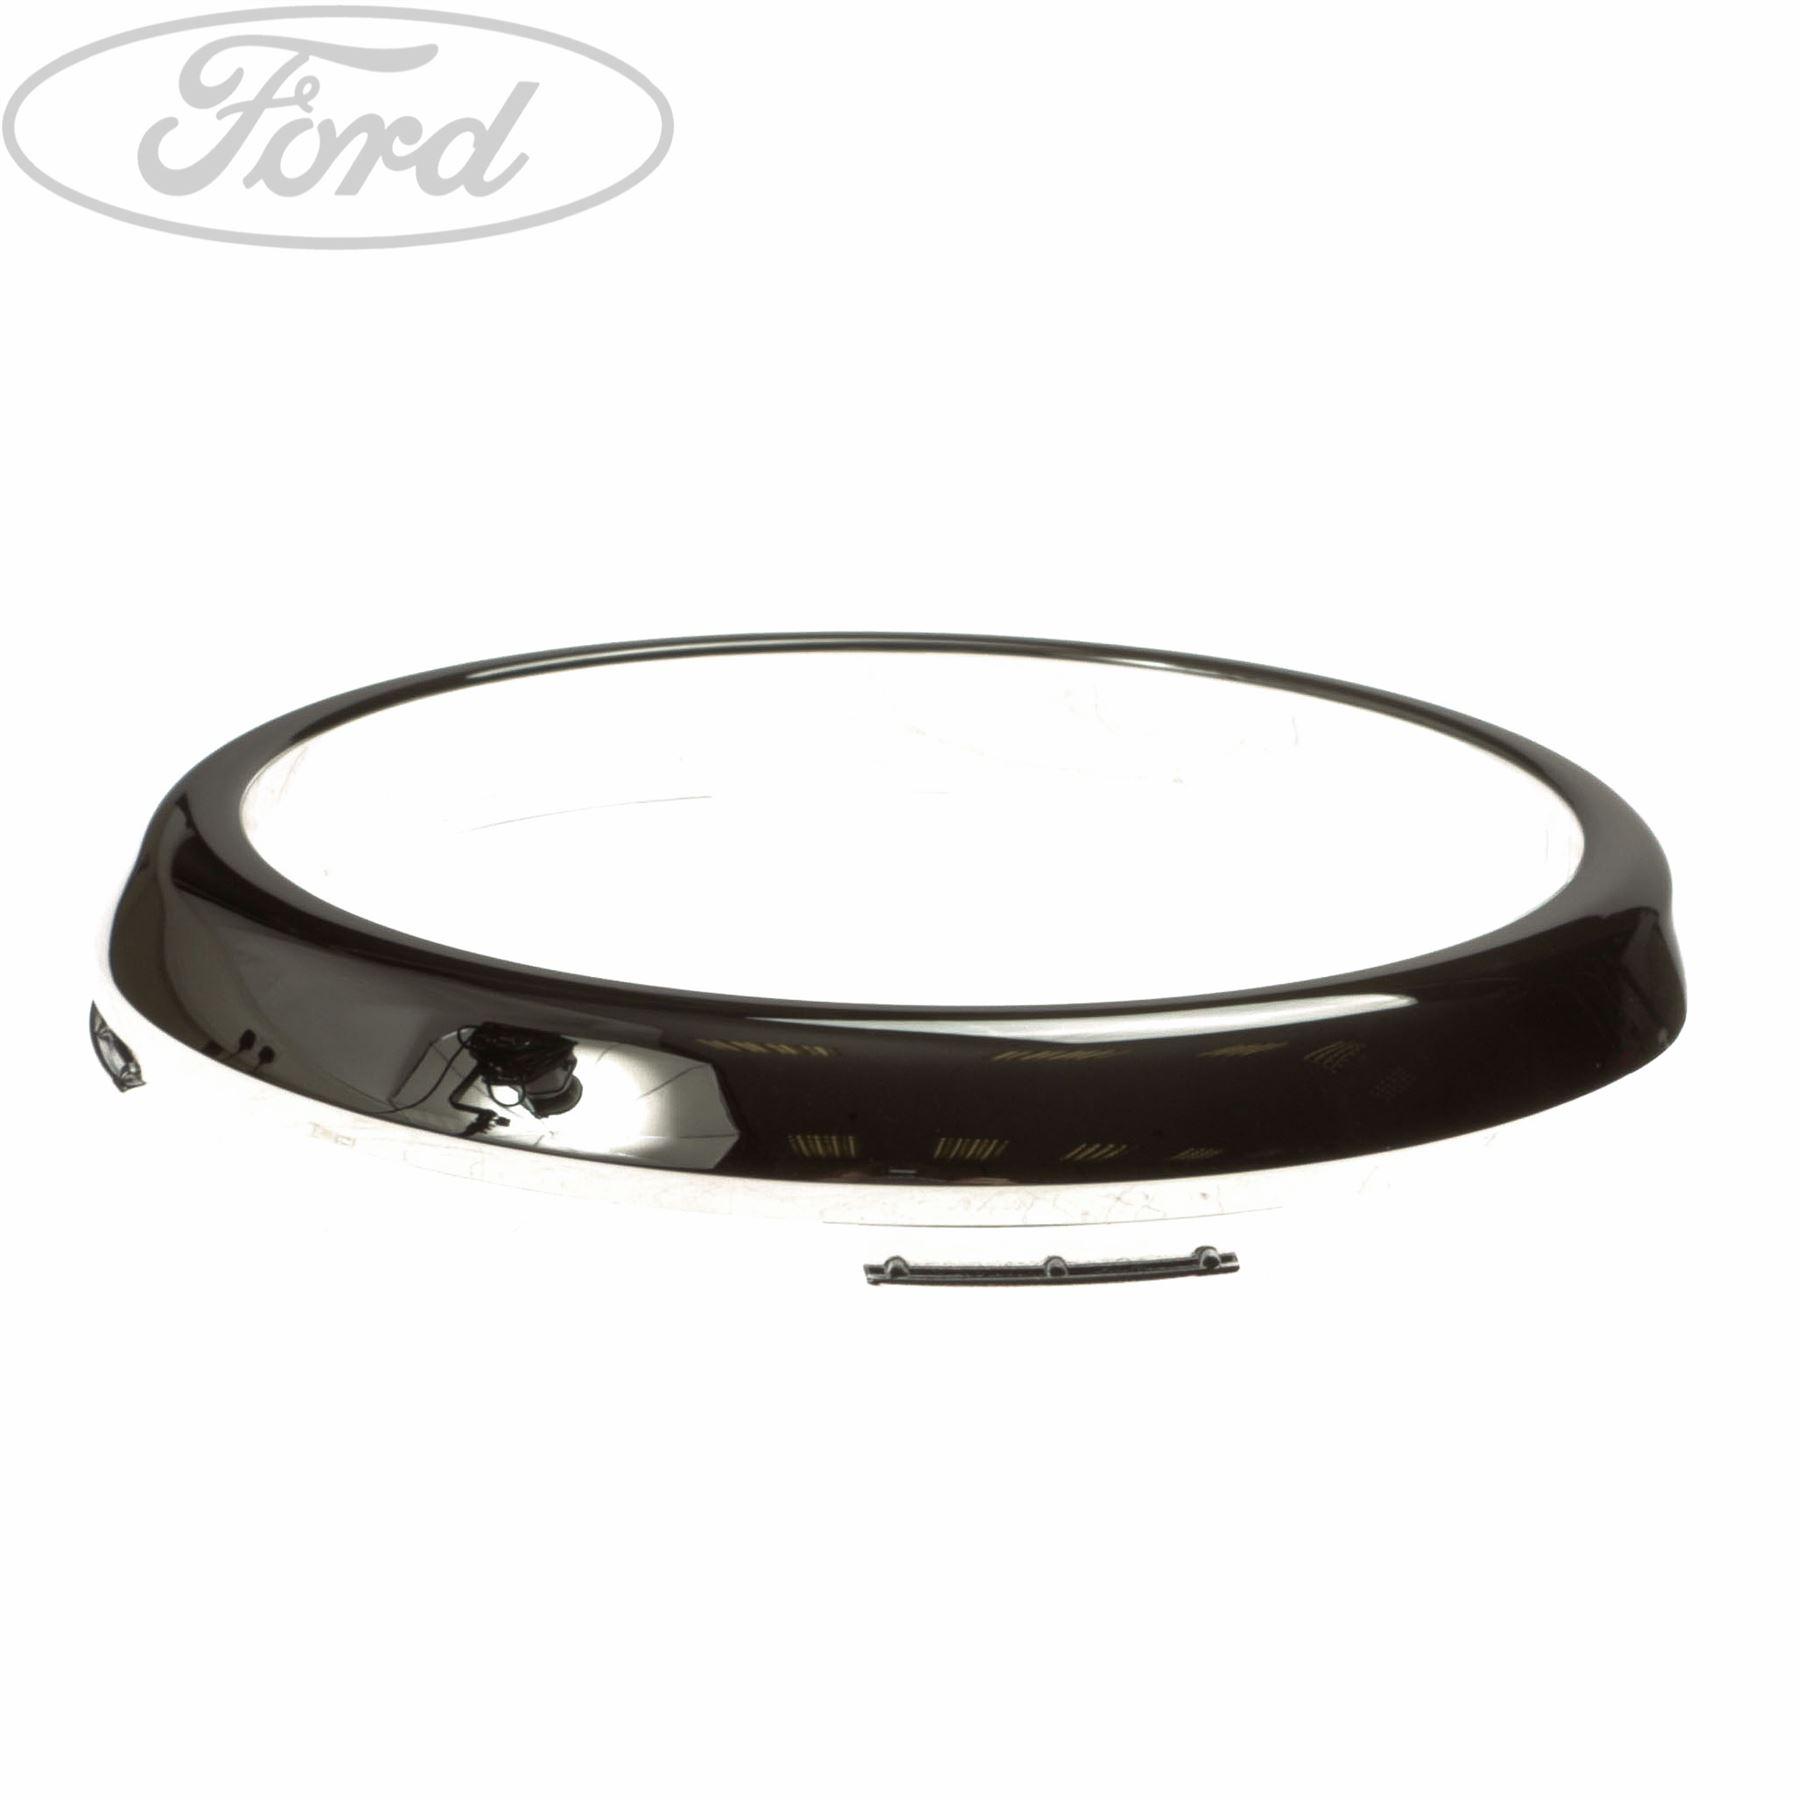 Genuine Ford C-Max MK2 Grand C-Max Focus MK2 Front Fog Light Bezel 1528748